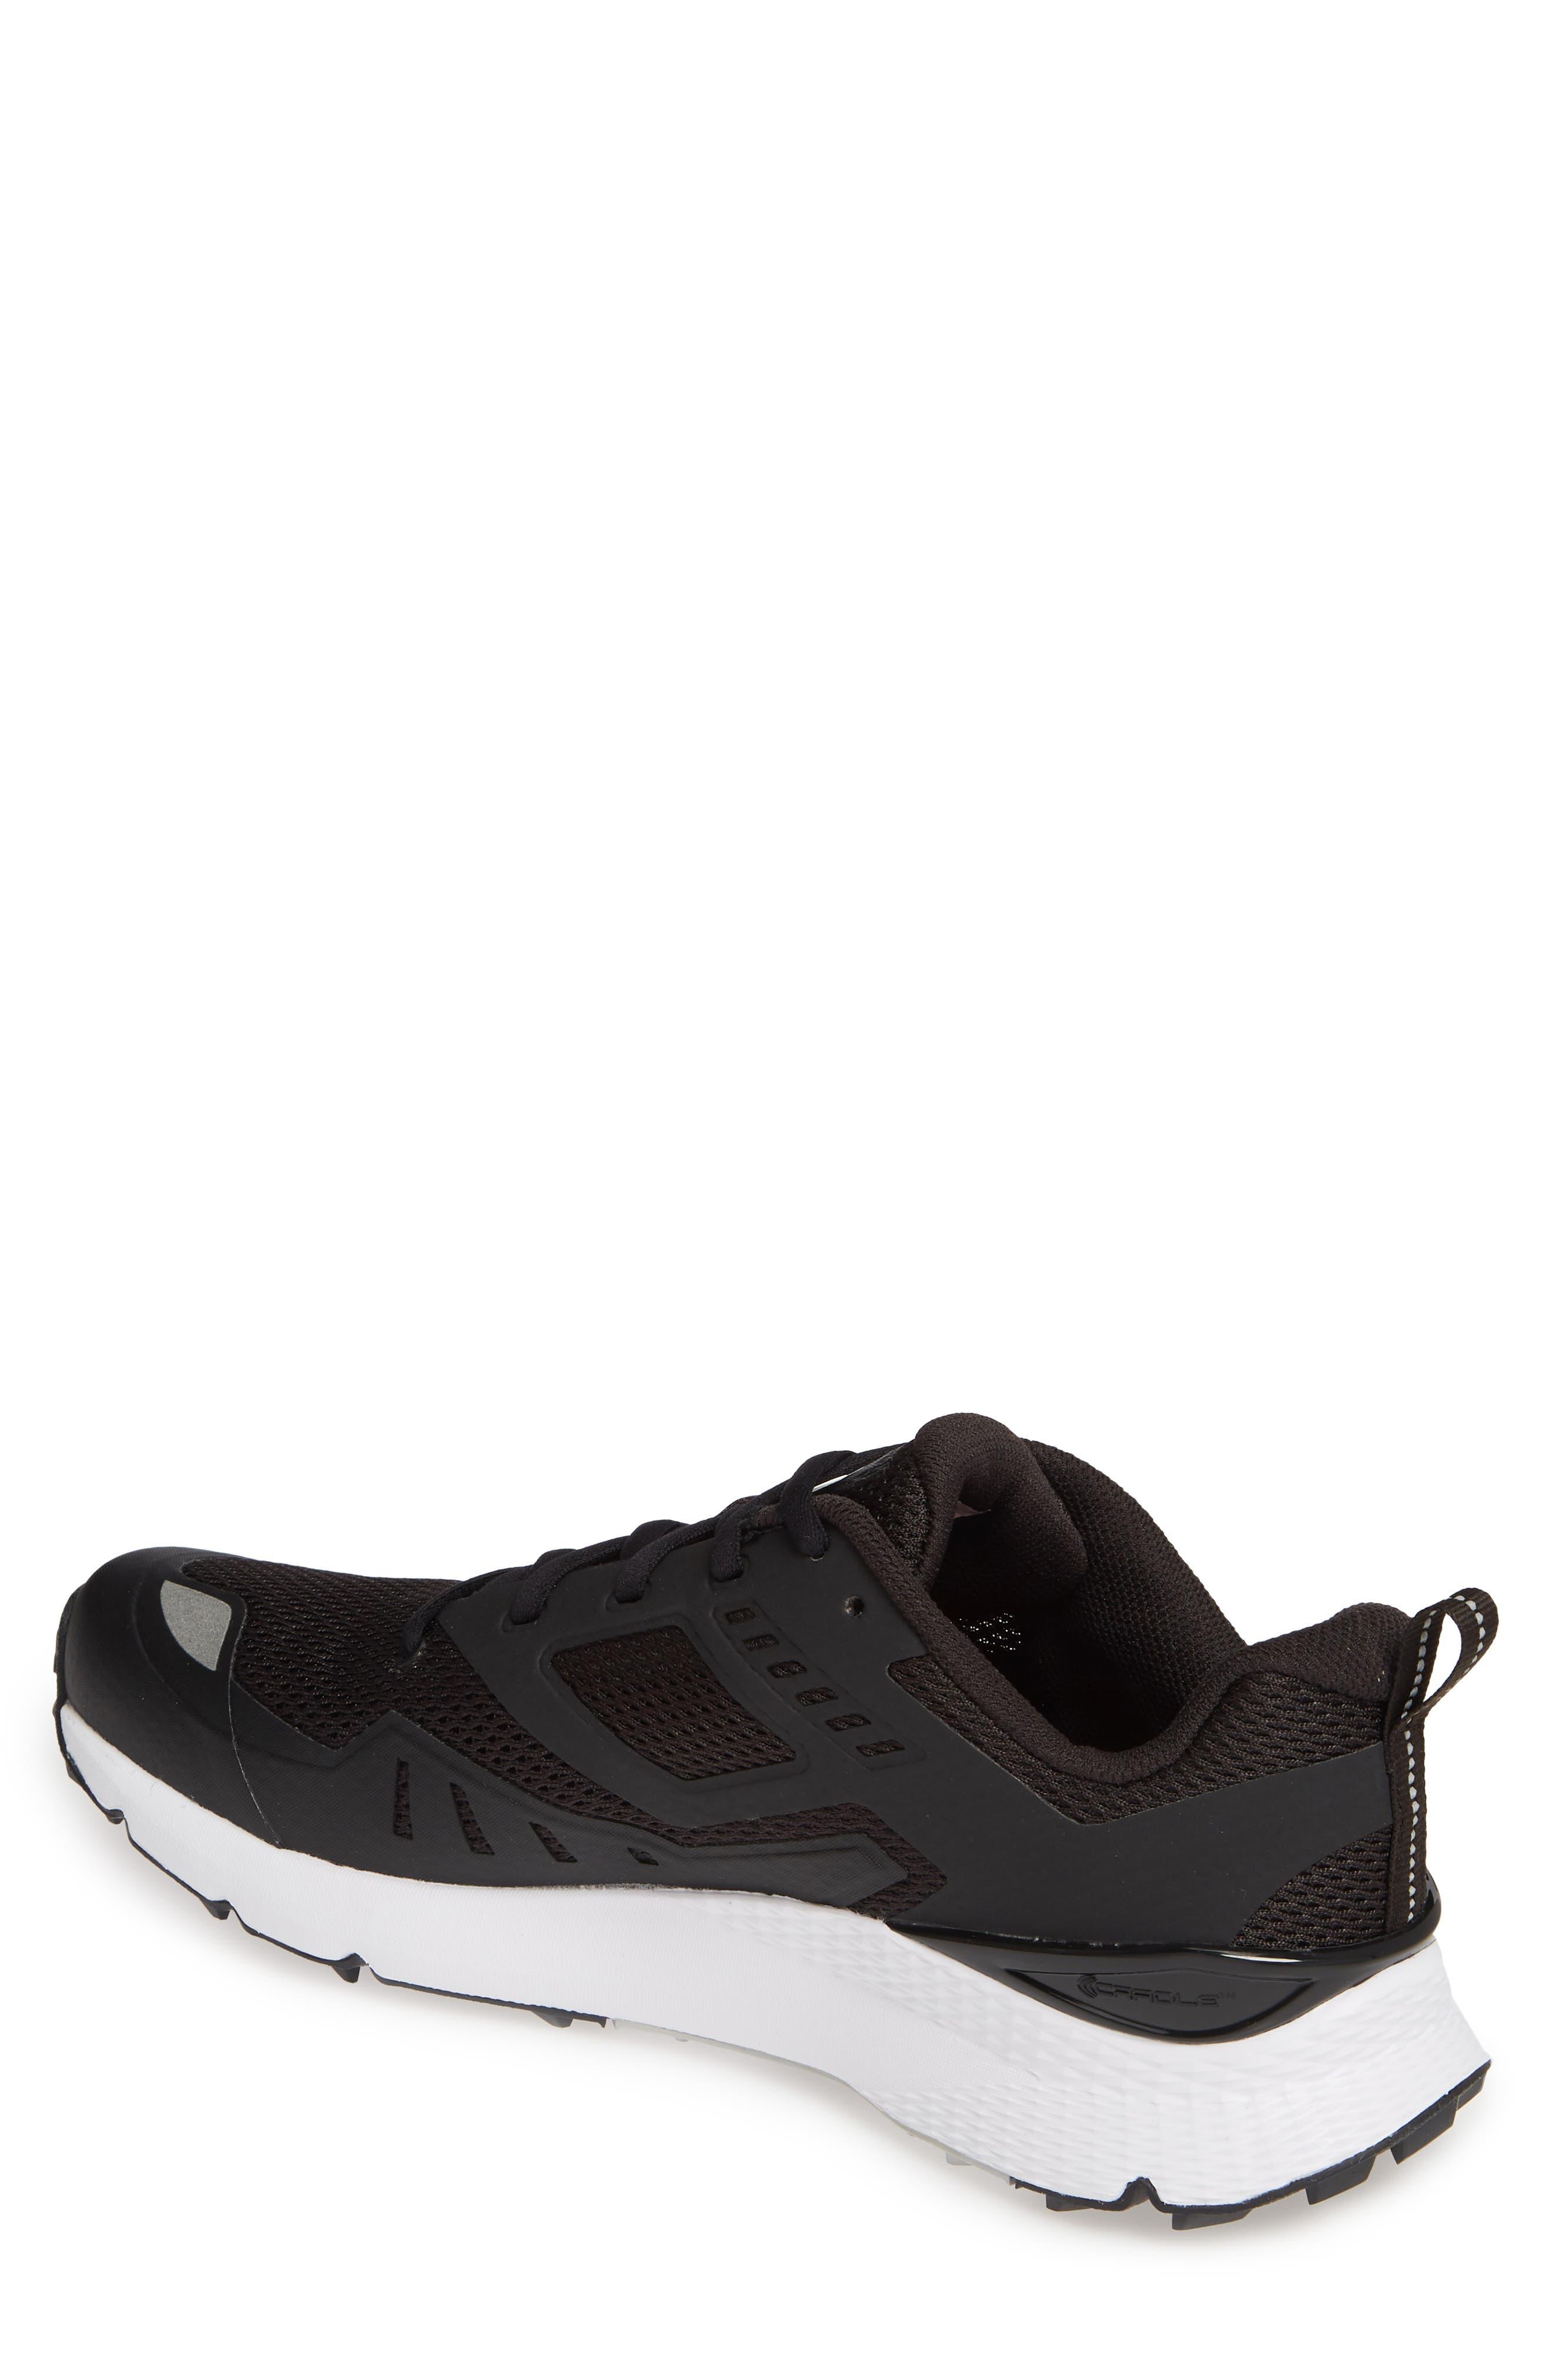 THE NORTH FACE, Rovereto Running Shoe, Alternate thumbnail 2, color, BLACK/ WHITE